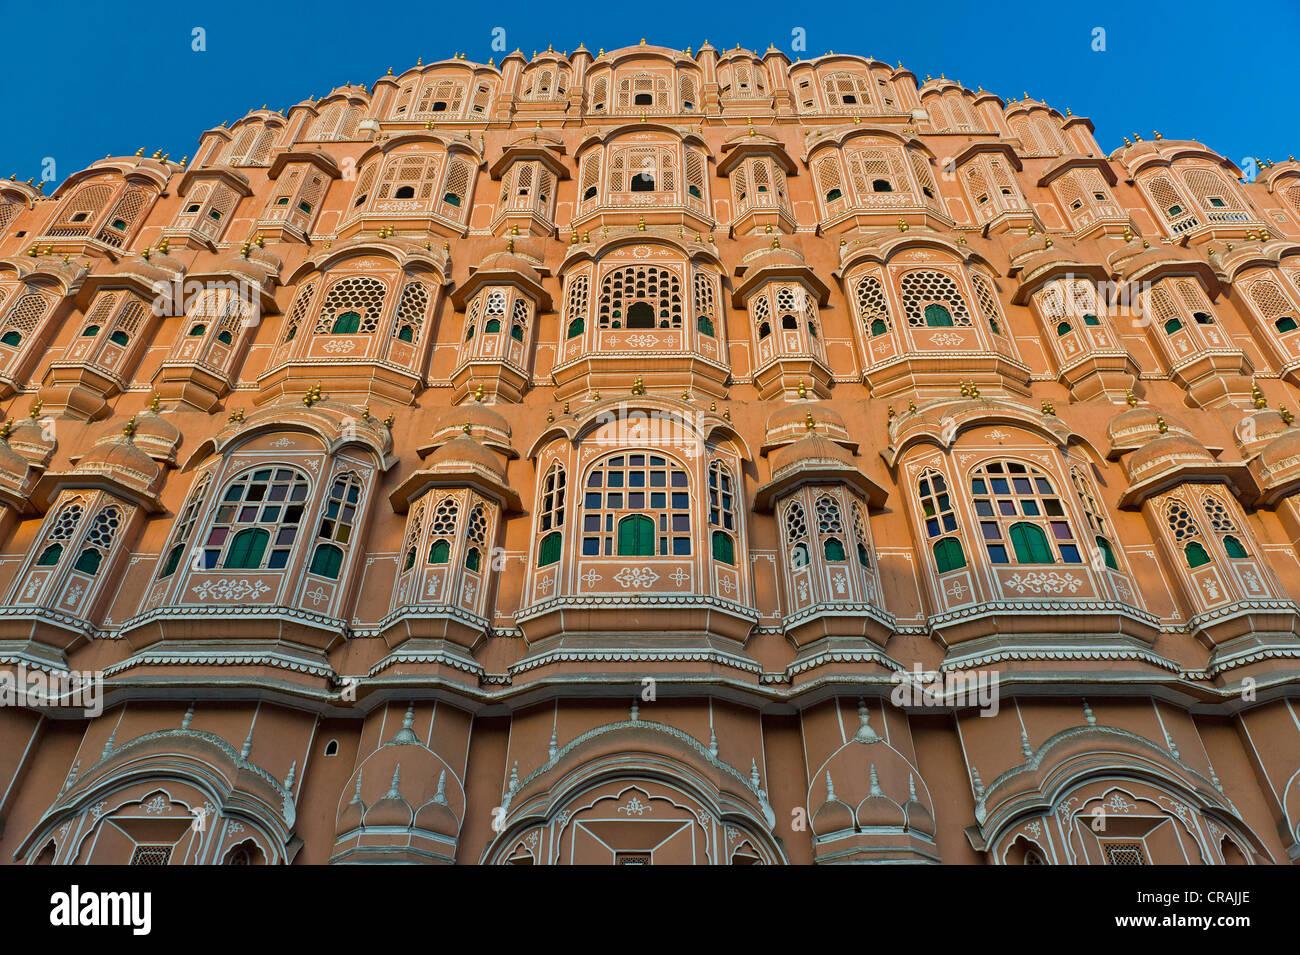 Hawa Mahal, Palace of Winds, Jaipur, Rajasthan, India, Asia - Stock Image